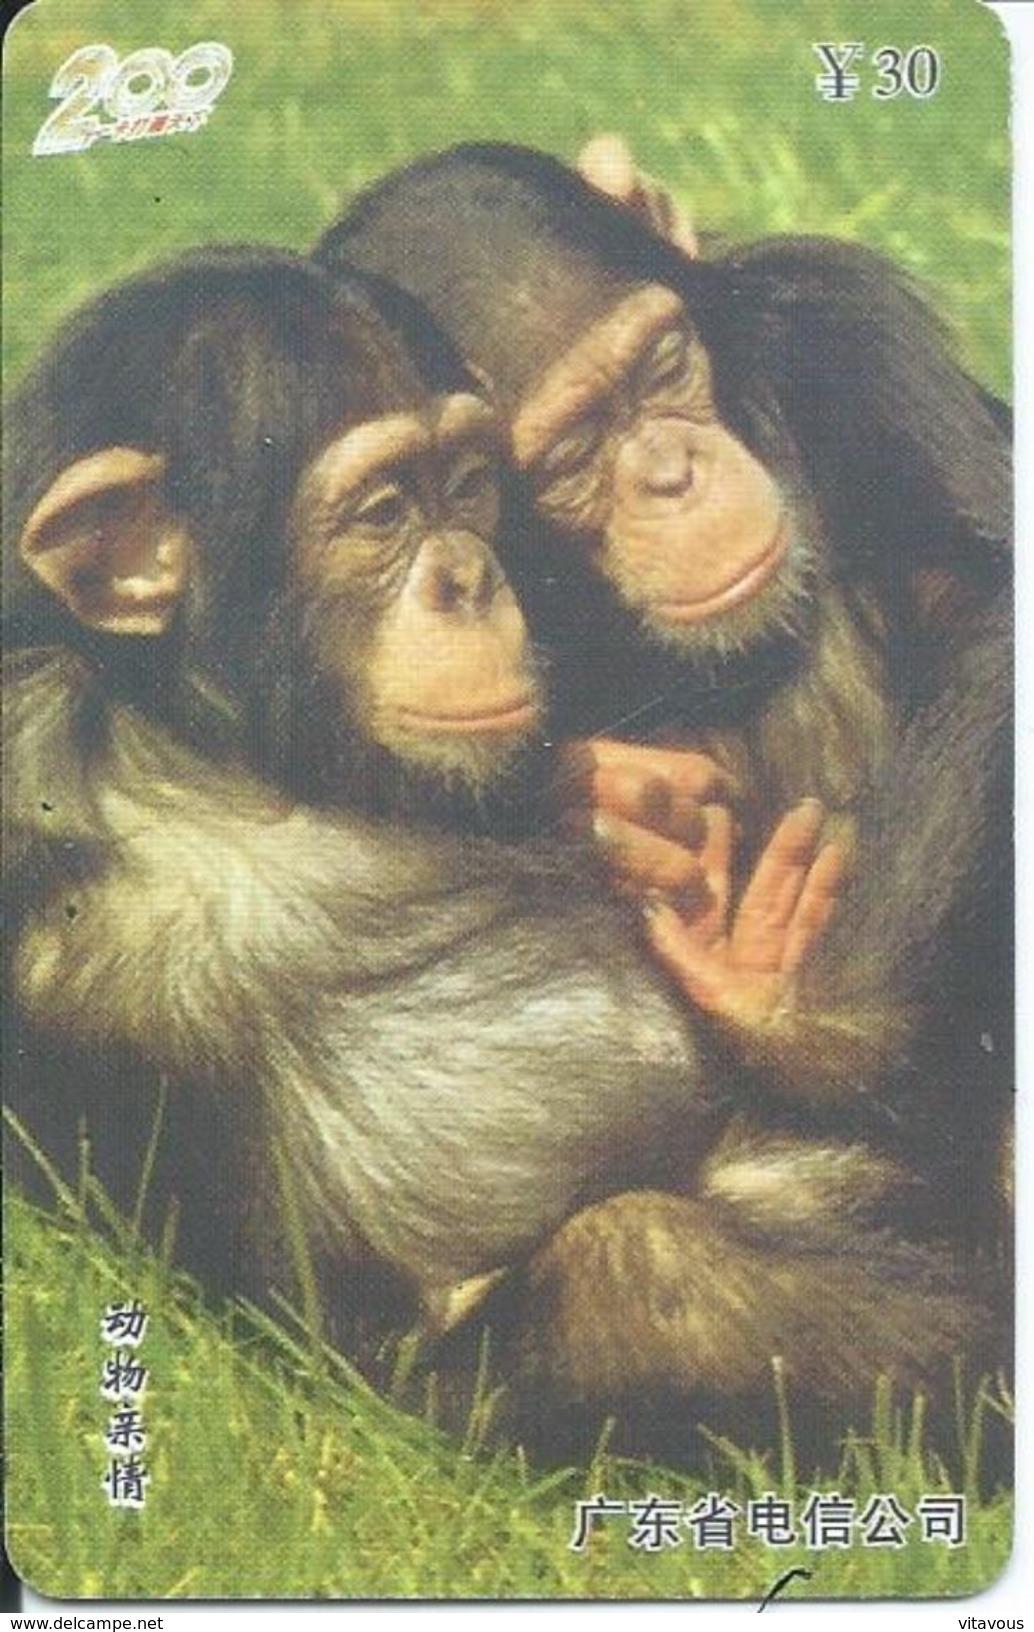 Singe Monkey Animal Jungle Télécarte Phonecard Telefonkarten (S399) - Jungle